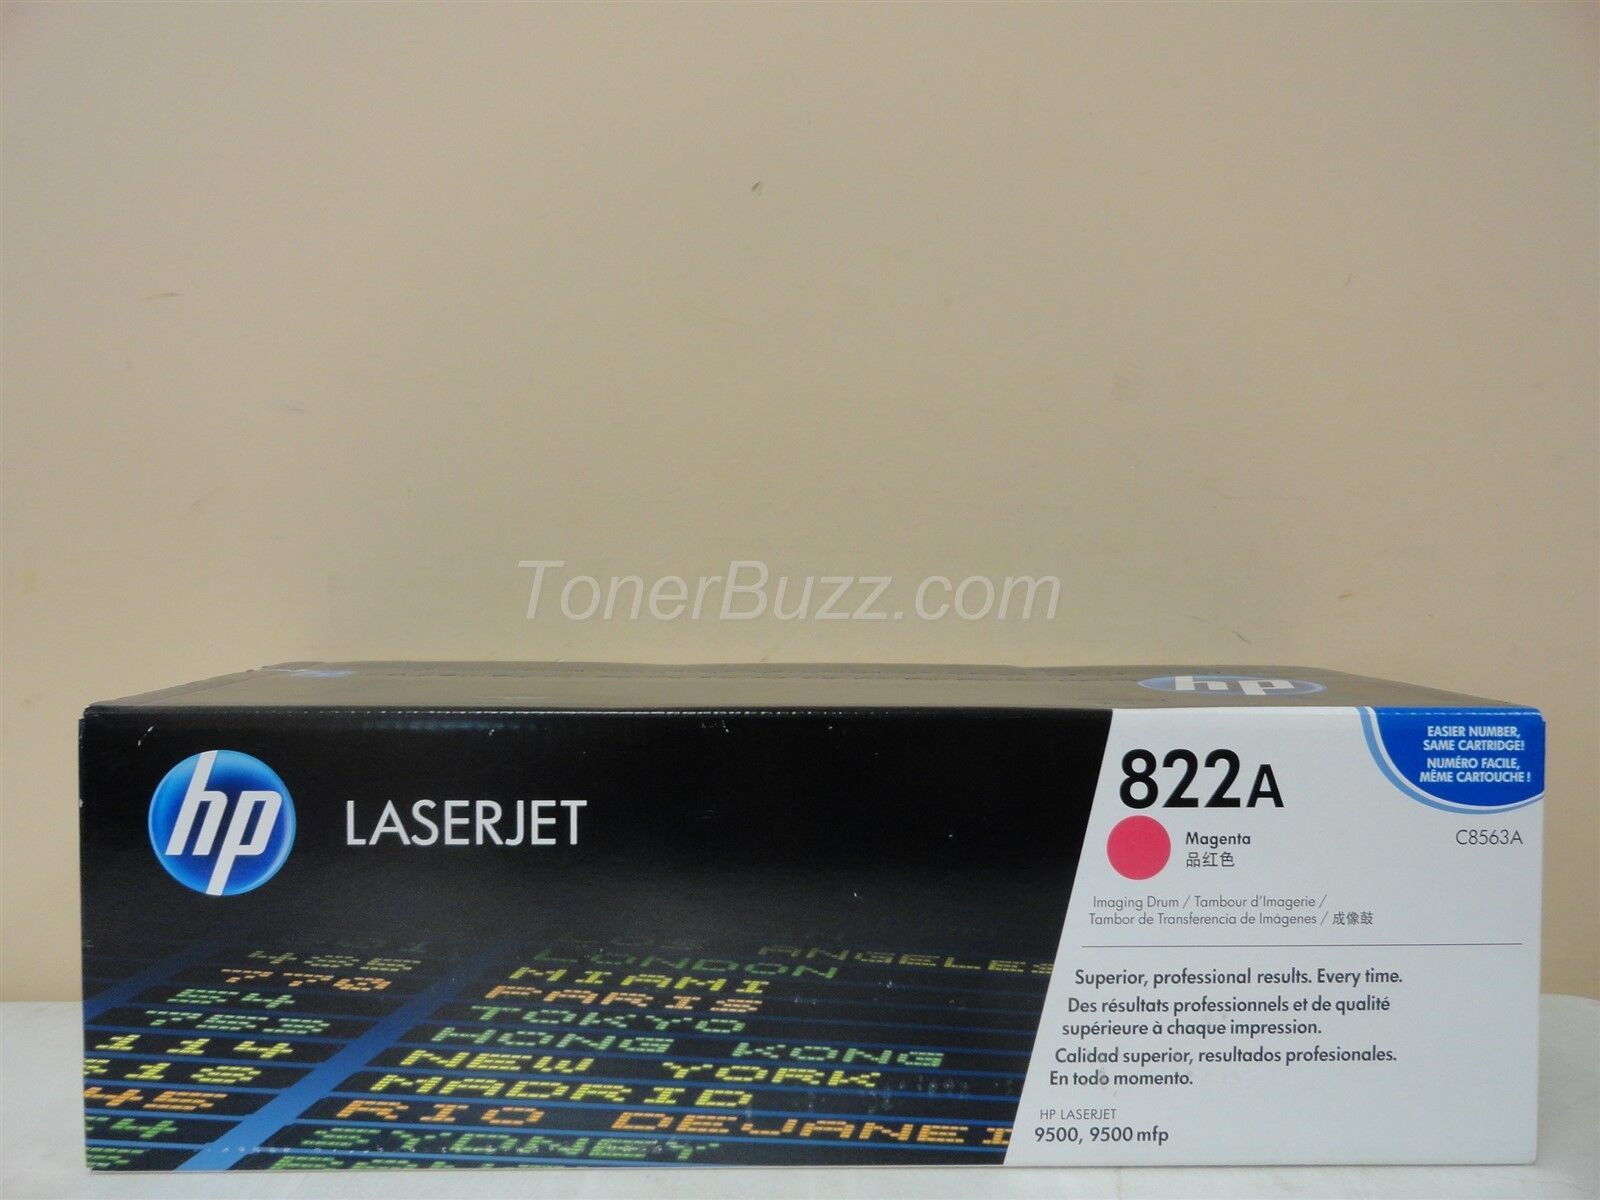 NEW SEALED BOX Genuine HP Color LaserJet C8563A Magenta Toner Imaging Drum